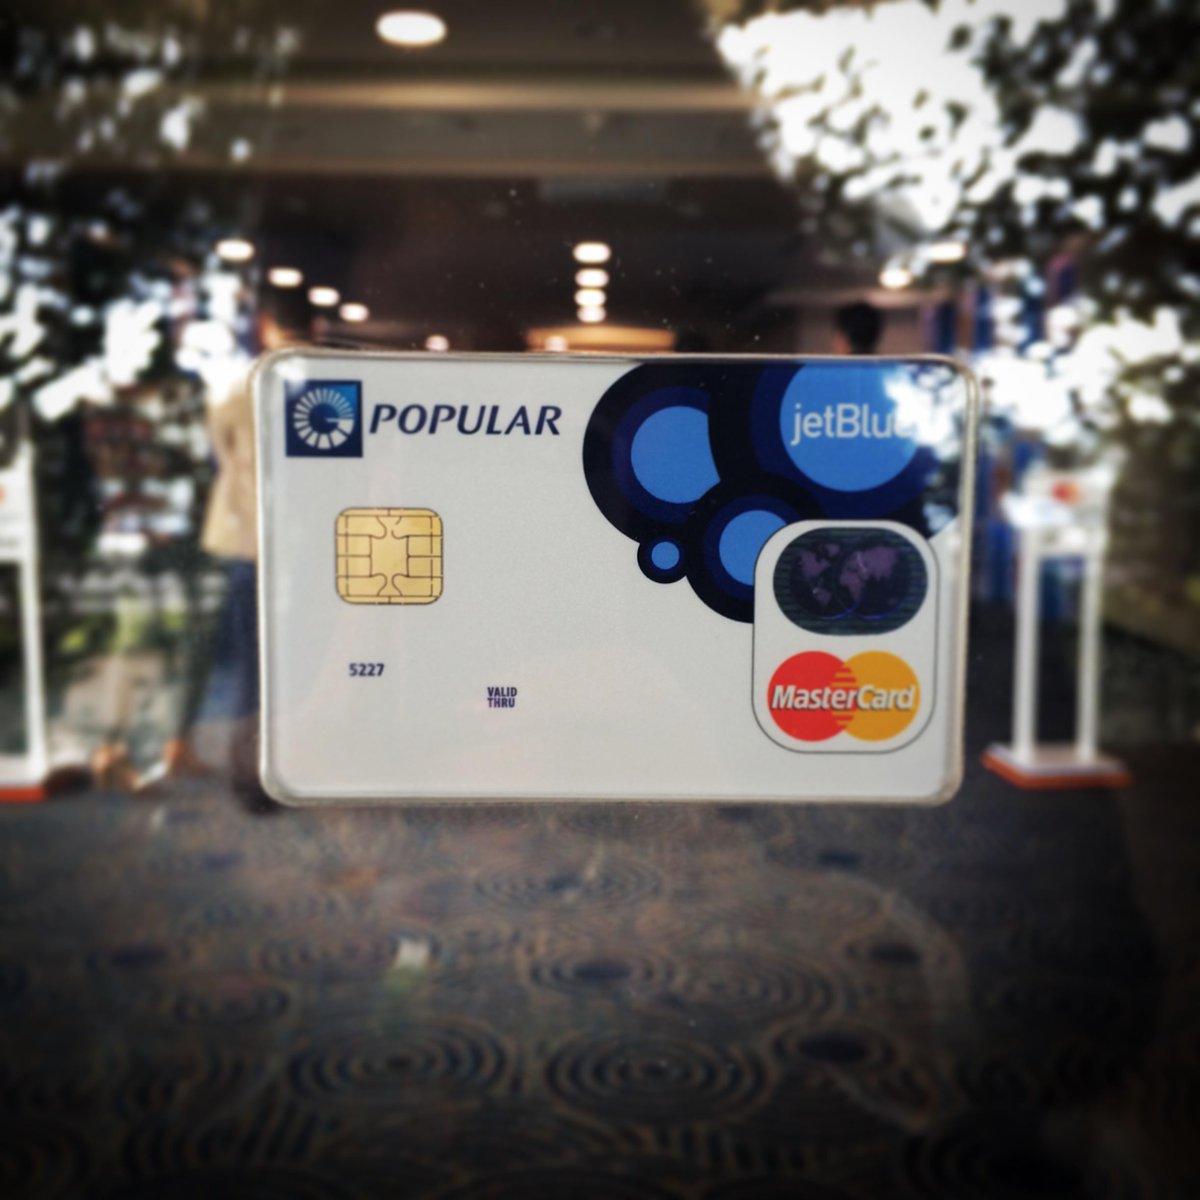 Te presentamos la nueva tarjeta #JetBlueMasterCard. http://t.co/GxZLsQixYC